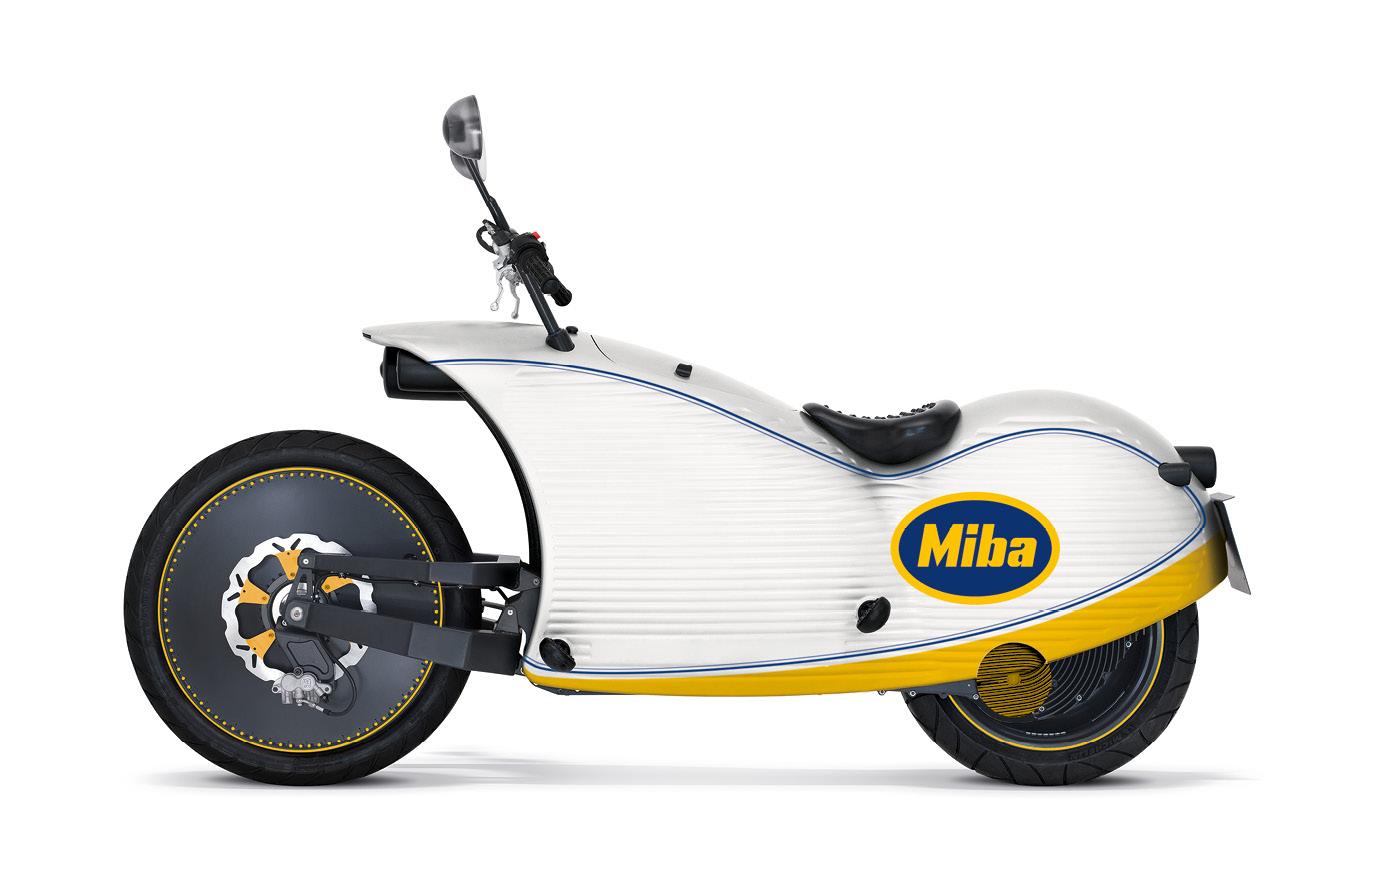 Miba Smc Motor